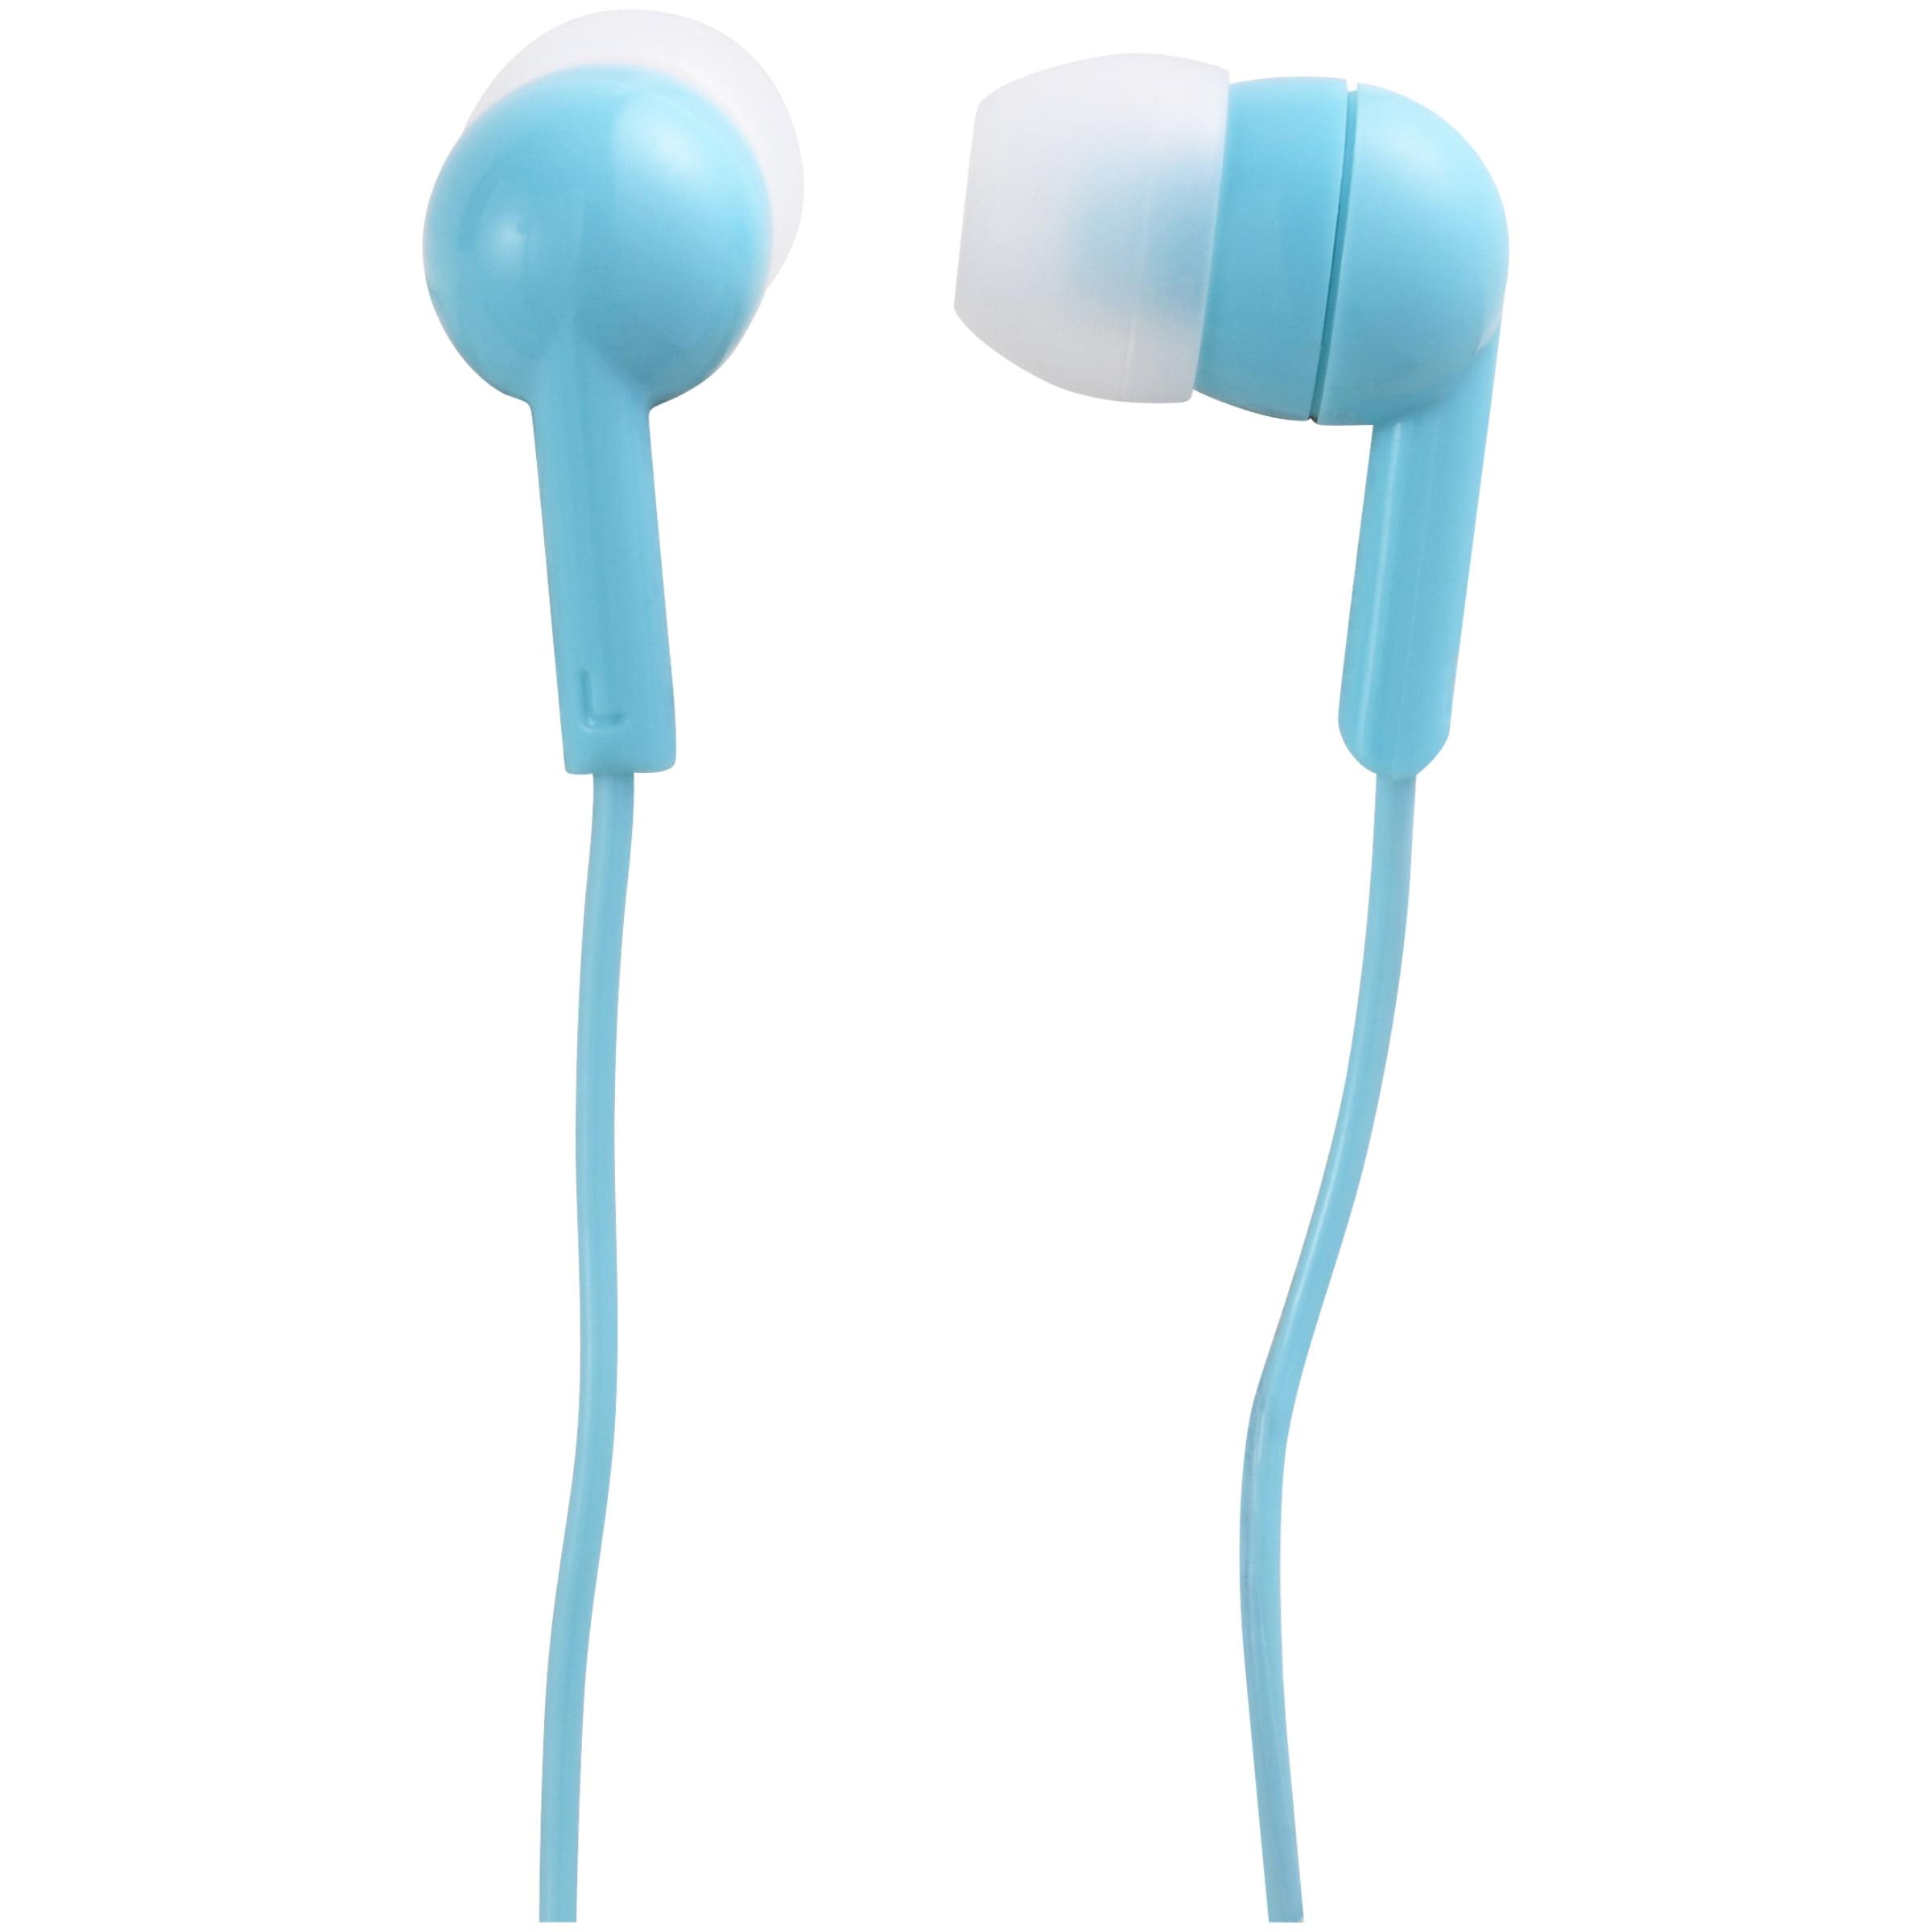 onn. Basic In-Ear Headphone Earbuds - Teal